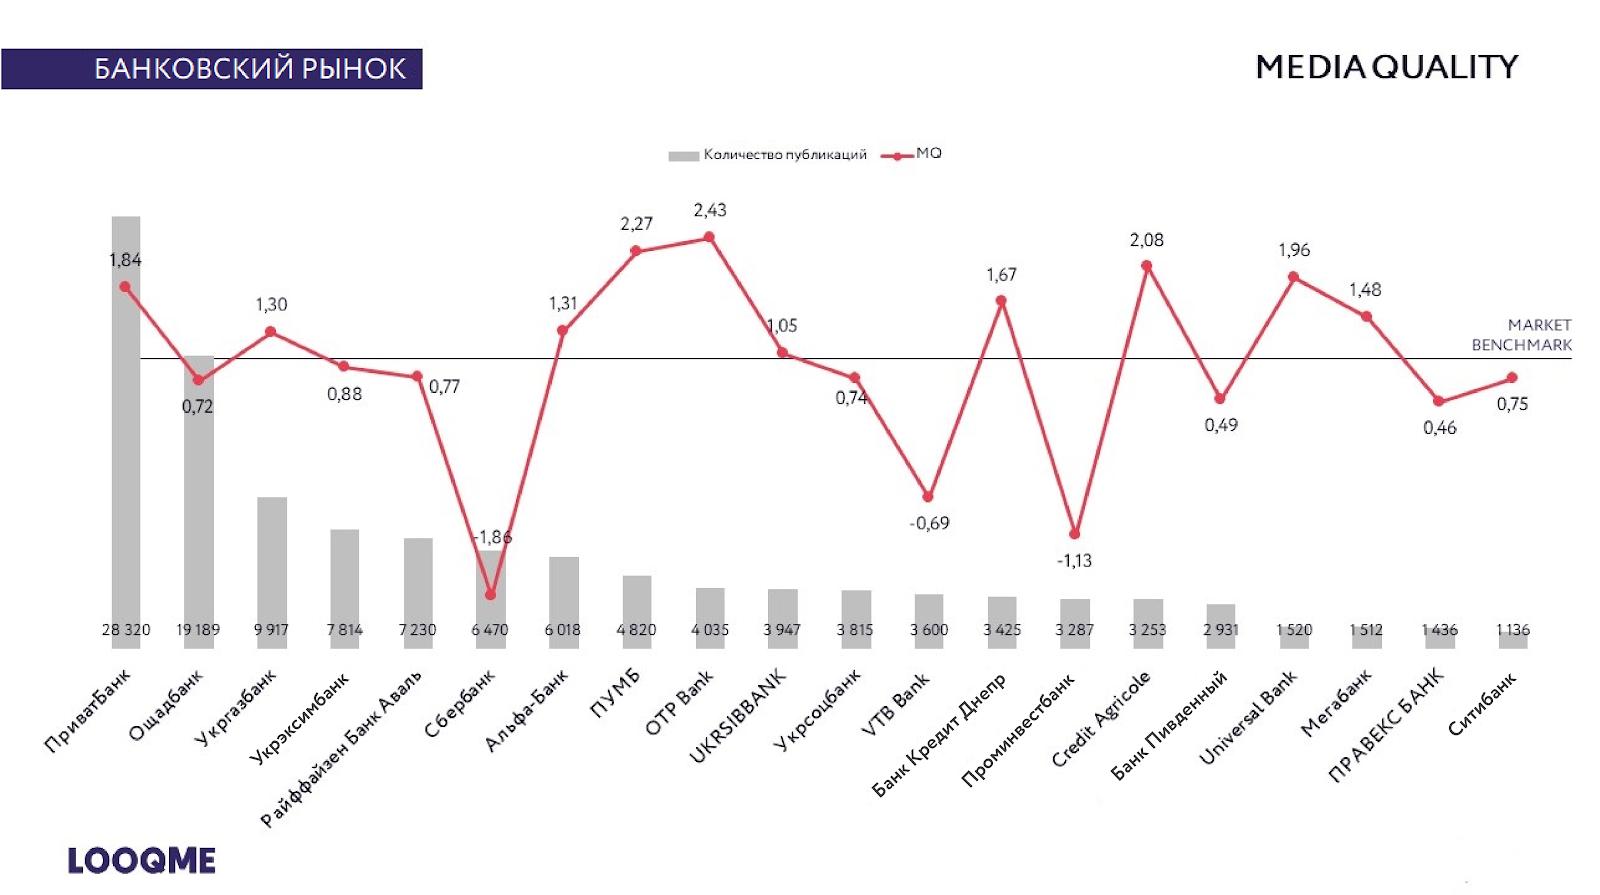 Банковский рынок: media quality